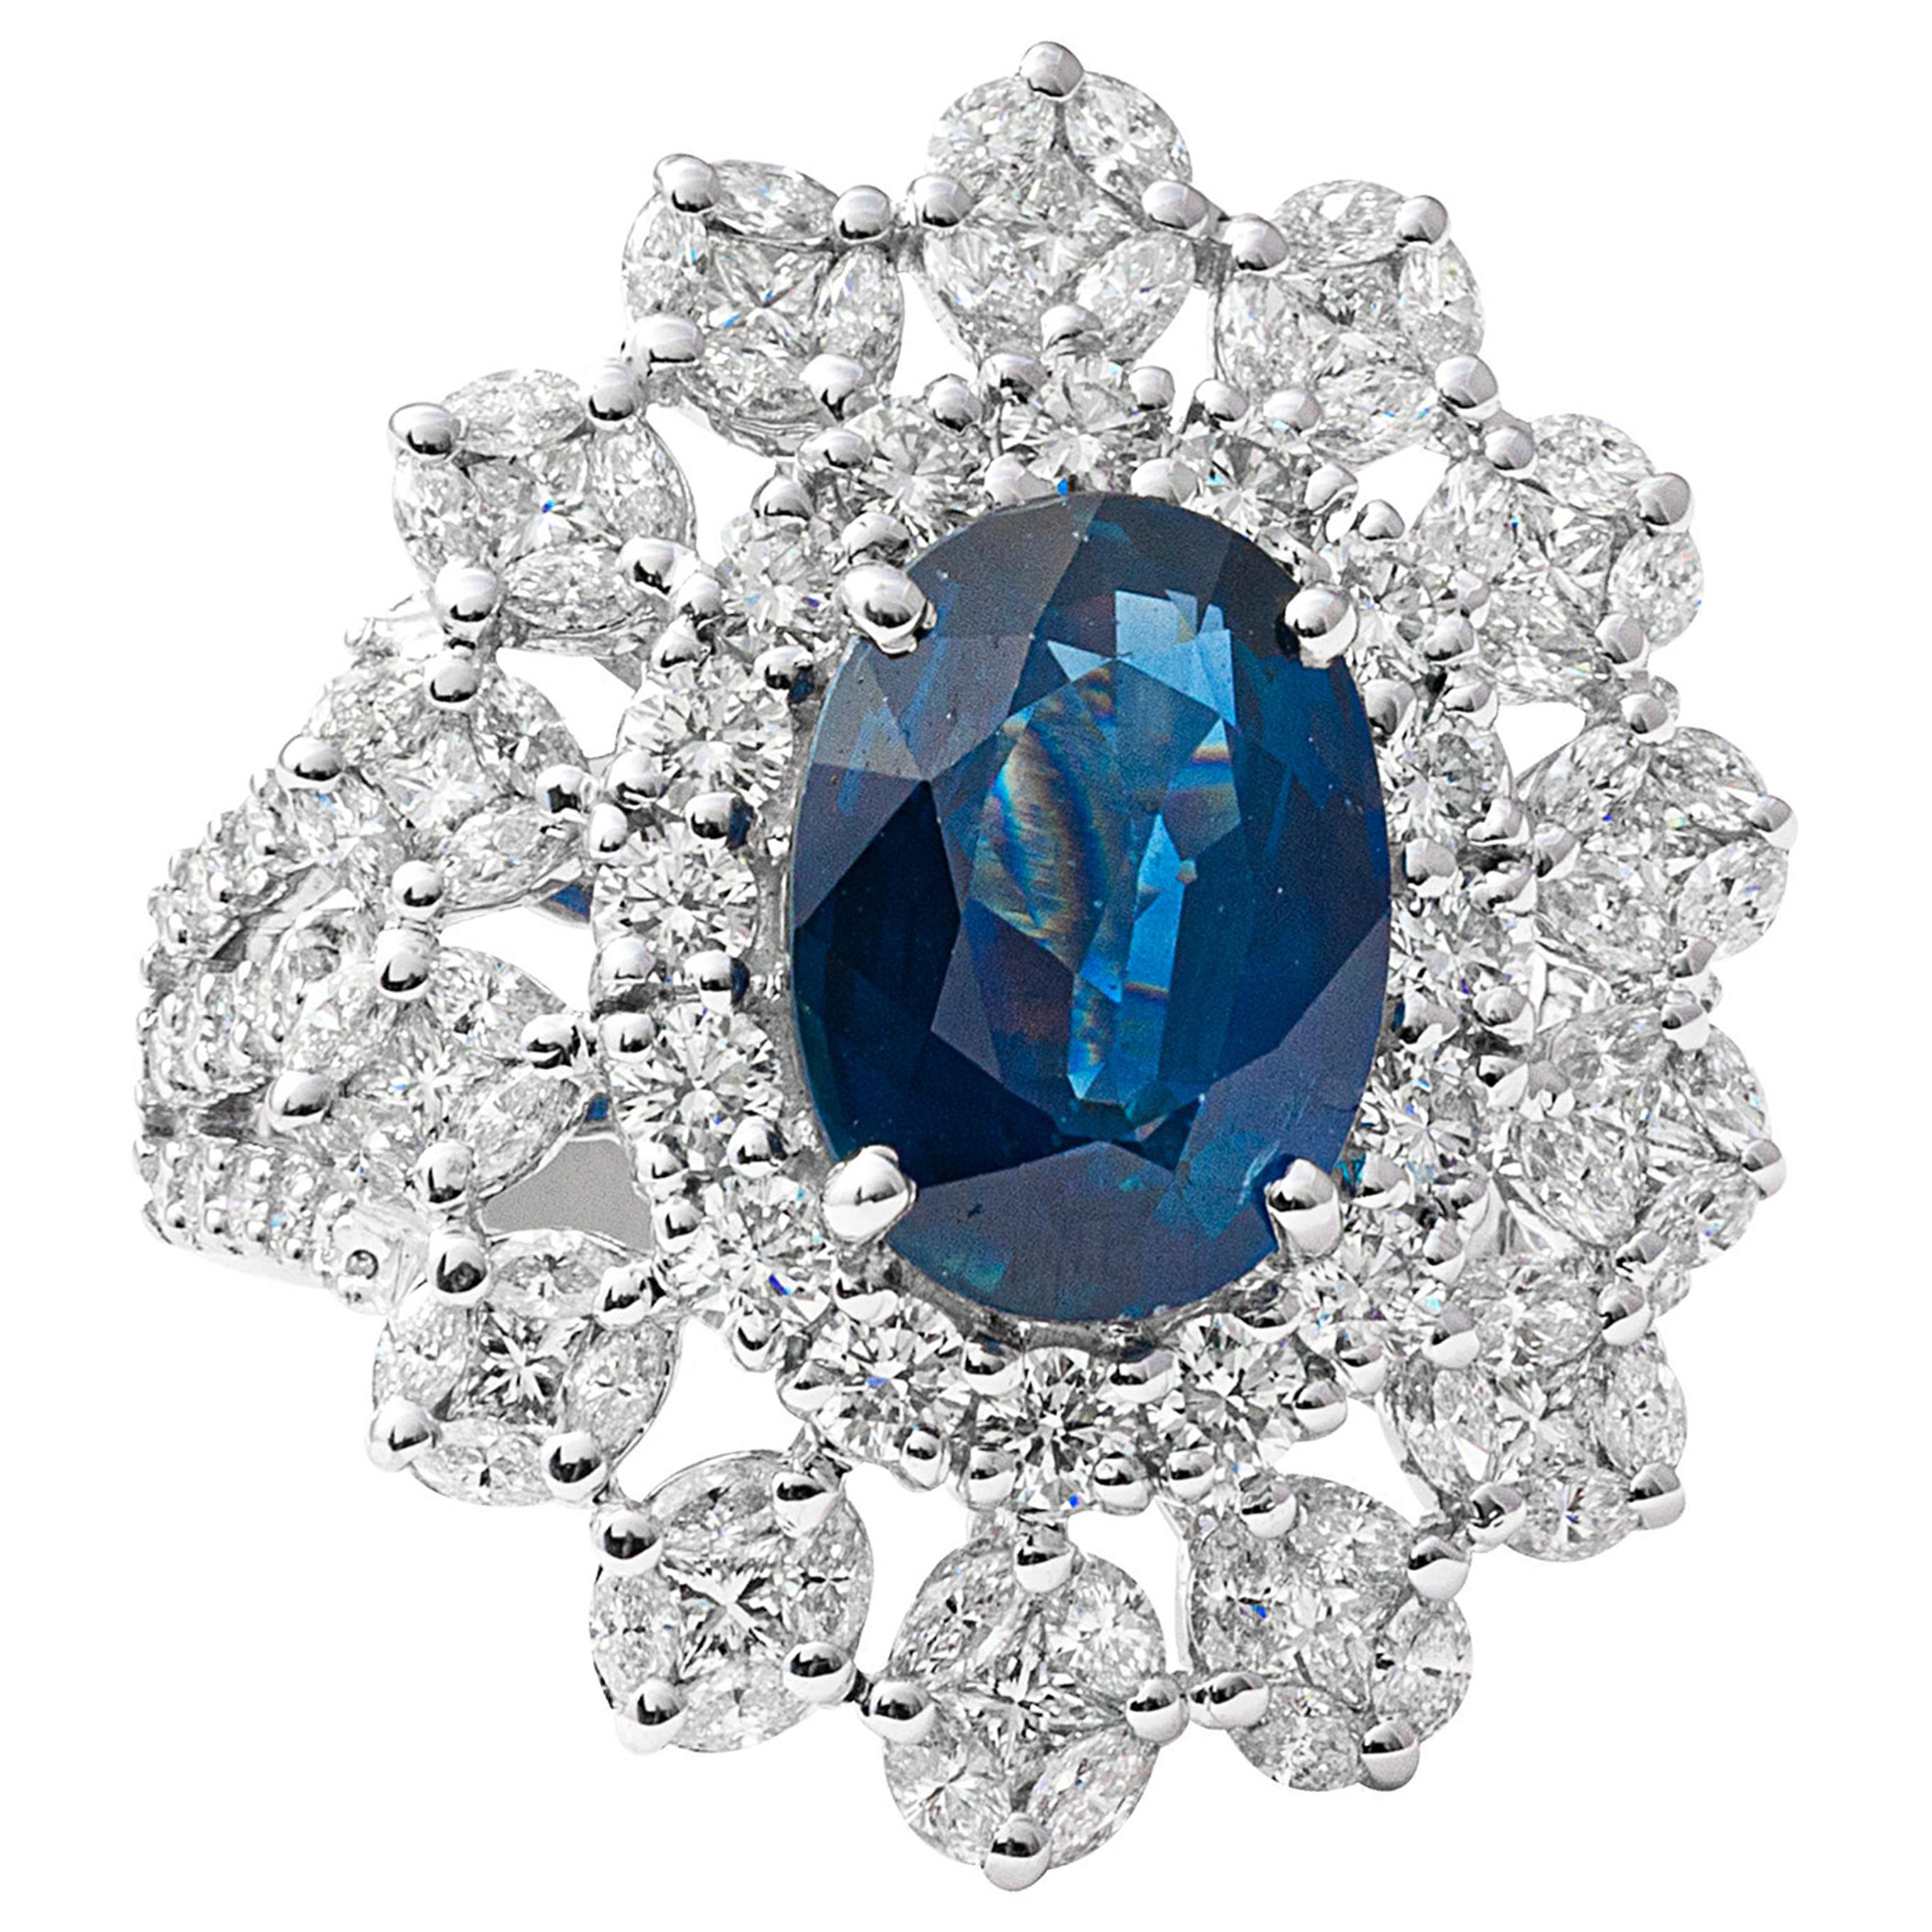 18 Karat White Gold Diamond and Blue Sapphire Cocktail Ring